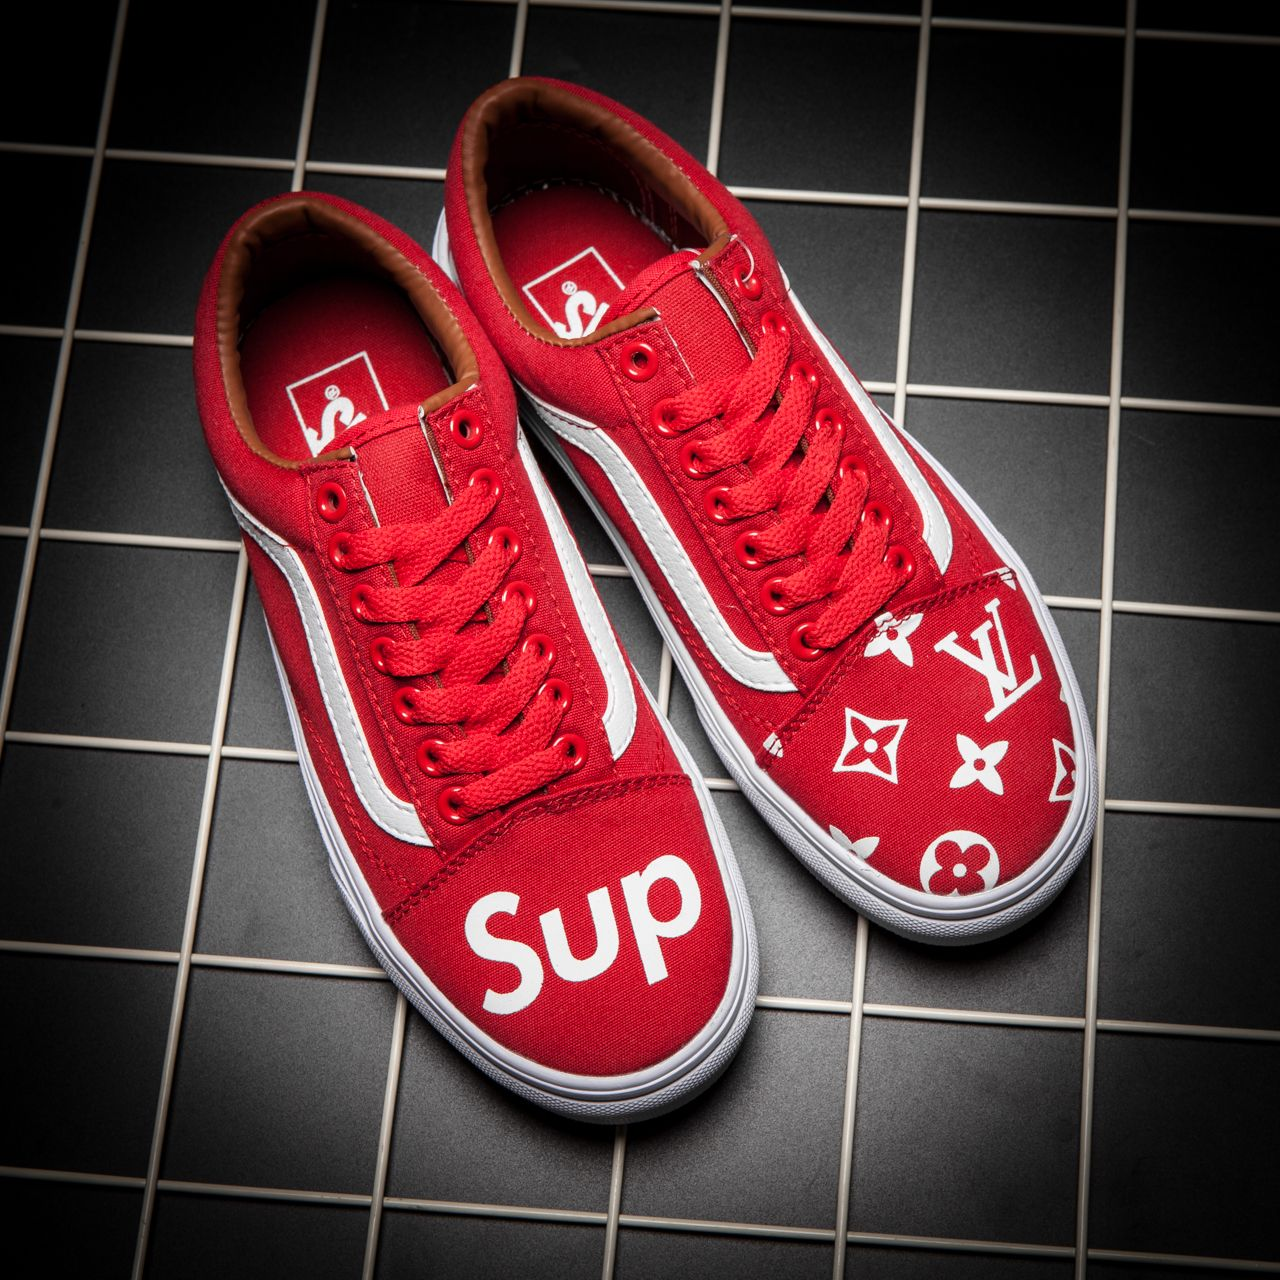 8f1add0045 VANS X SUPREME X LV PRINTED CUSTOM MADE SLIP ON SP03 RED